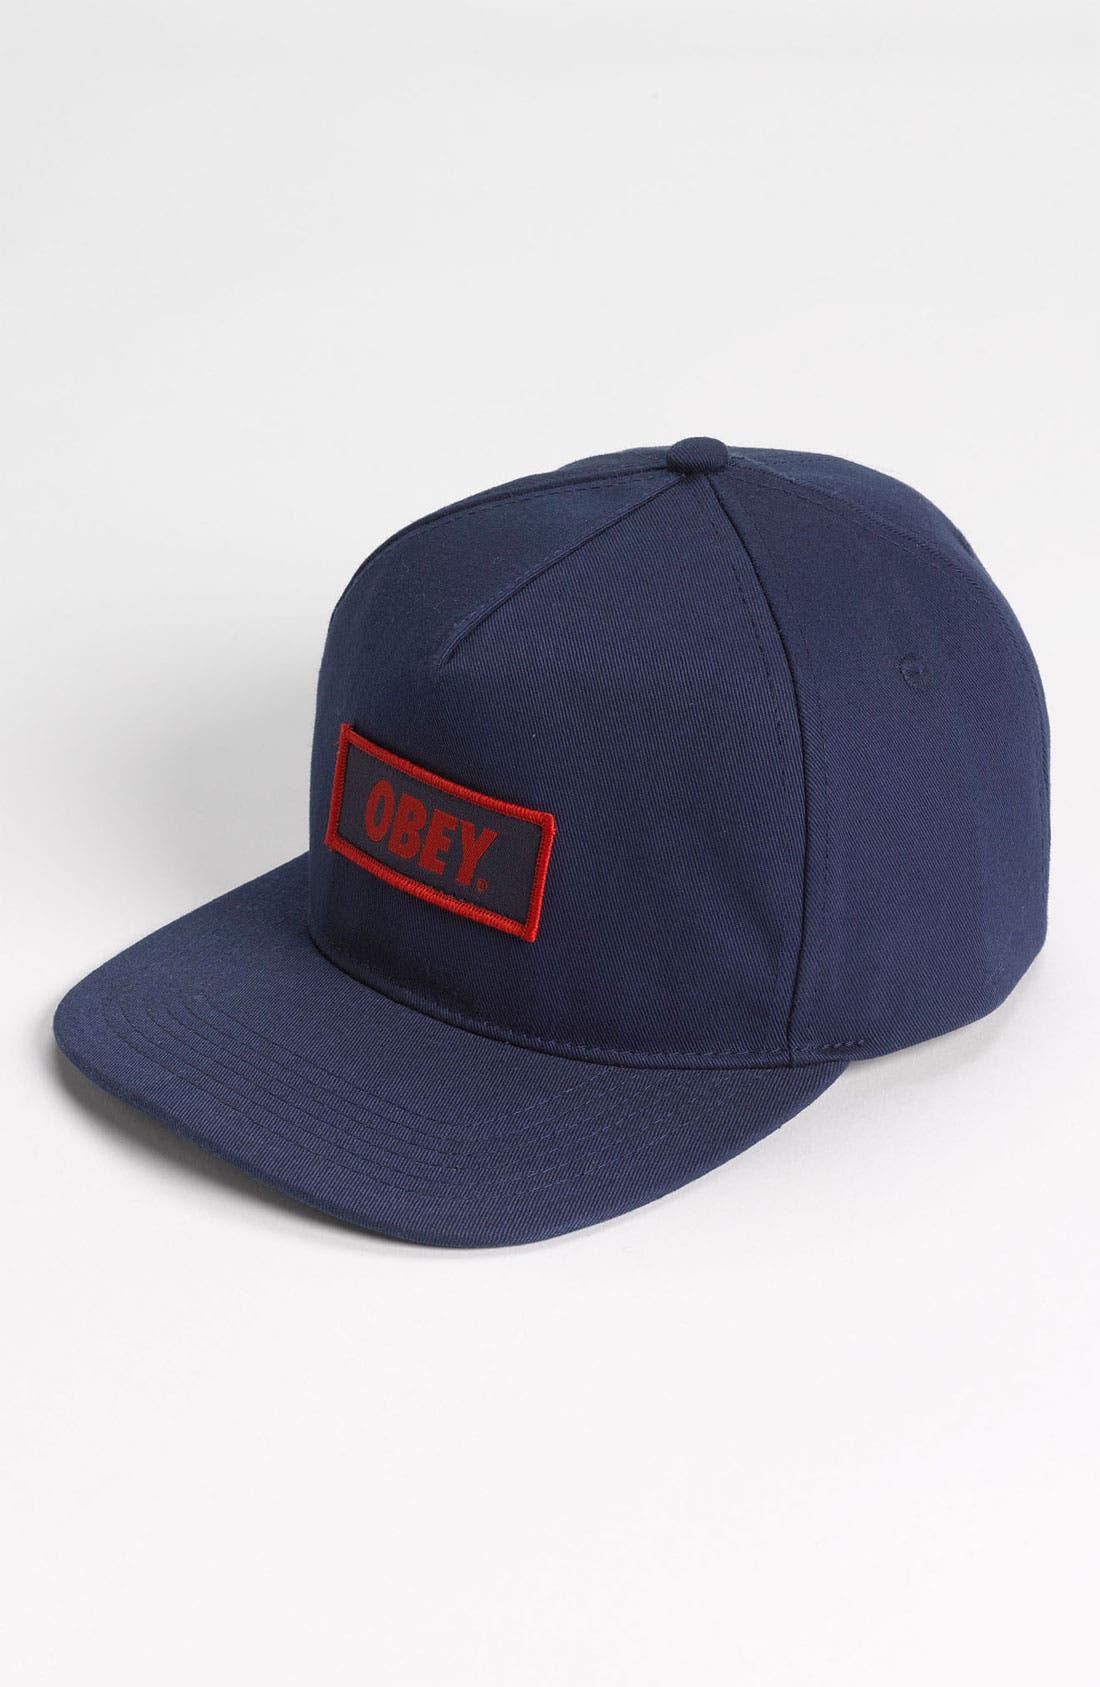 Alternate Image 1 Selected - Obey 'New Original' Snapback Hat